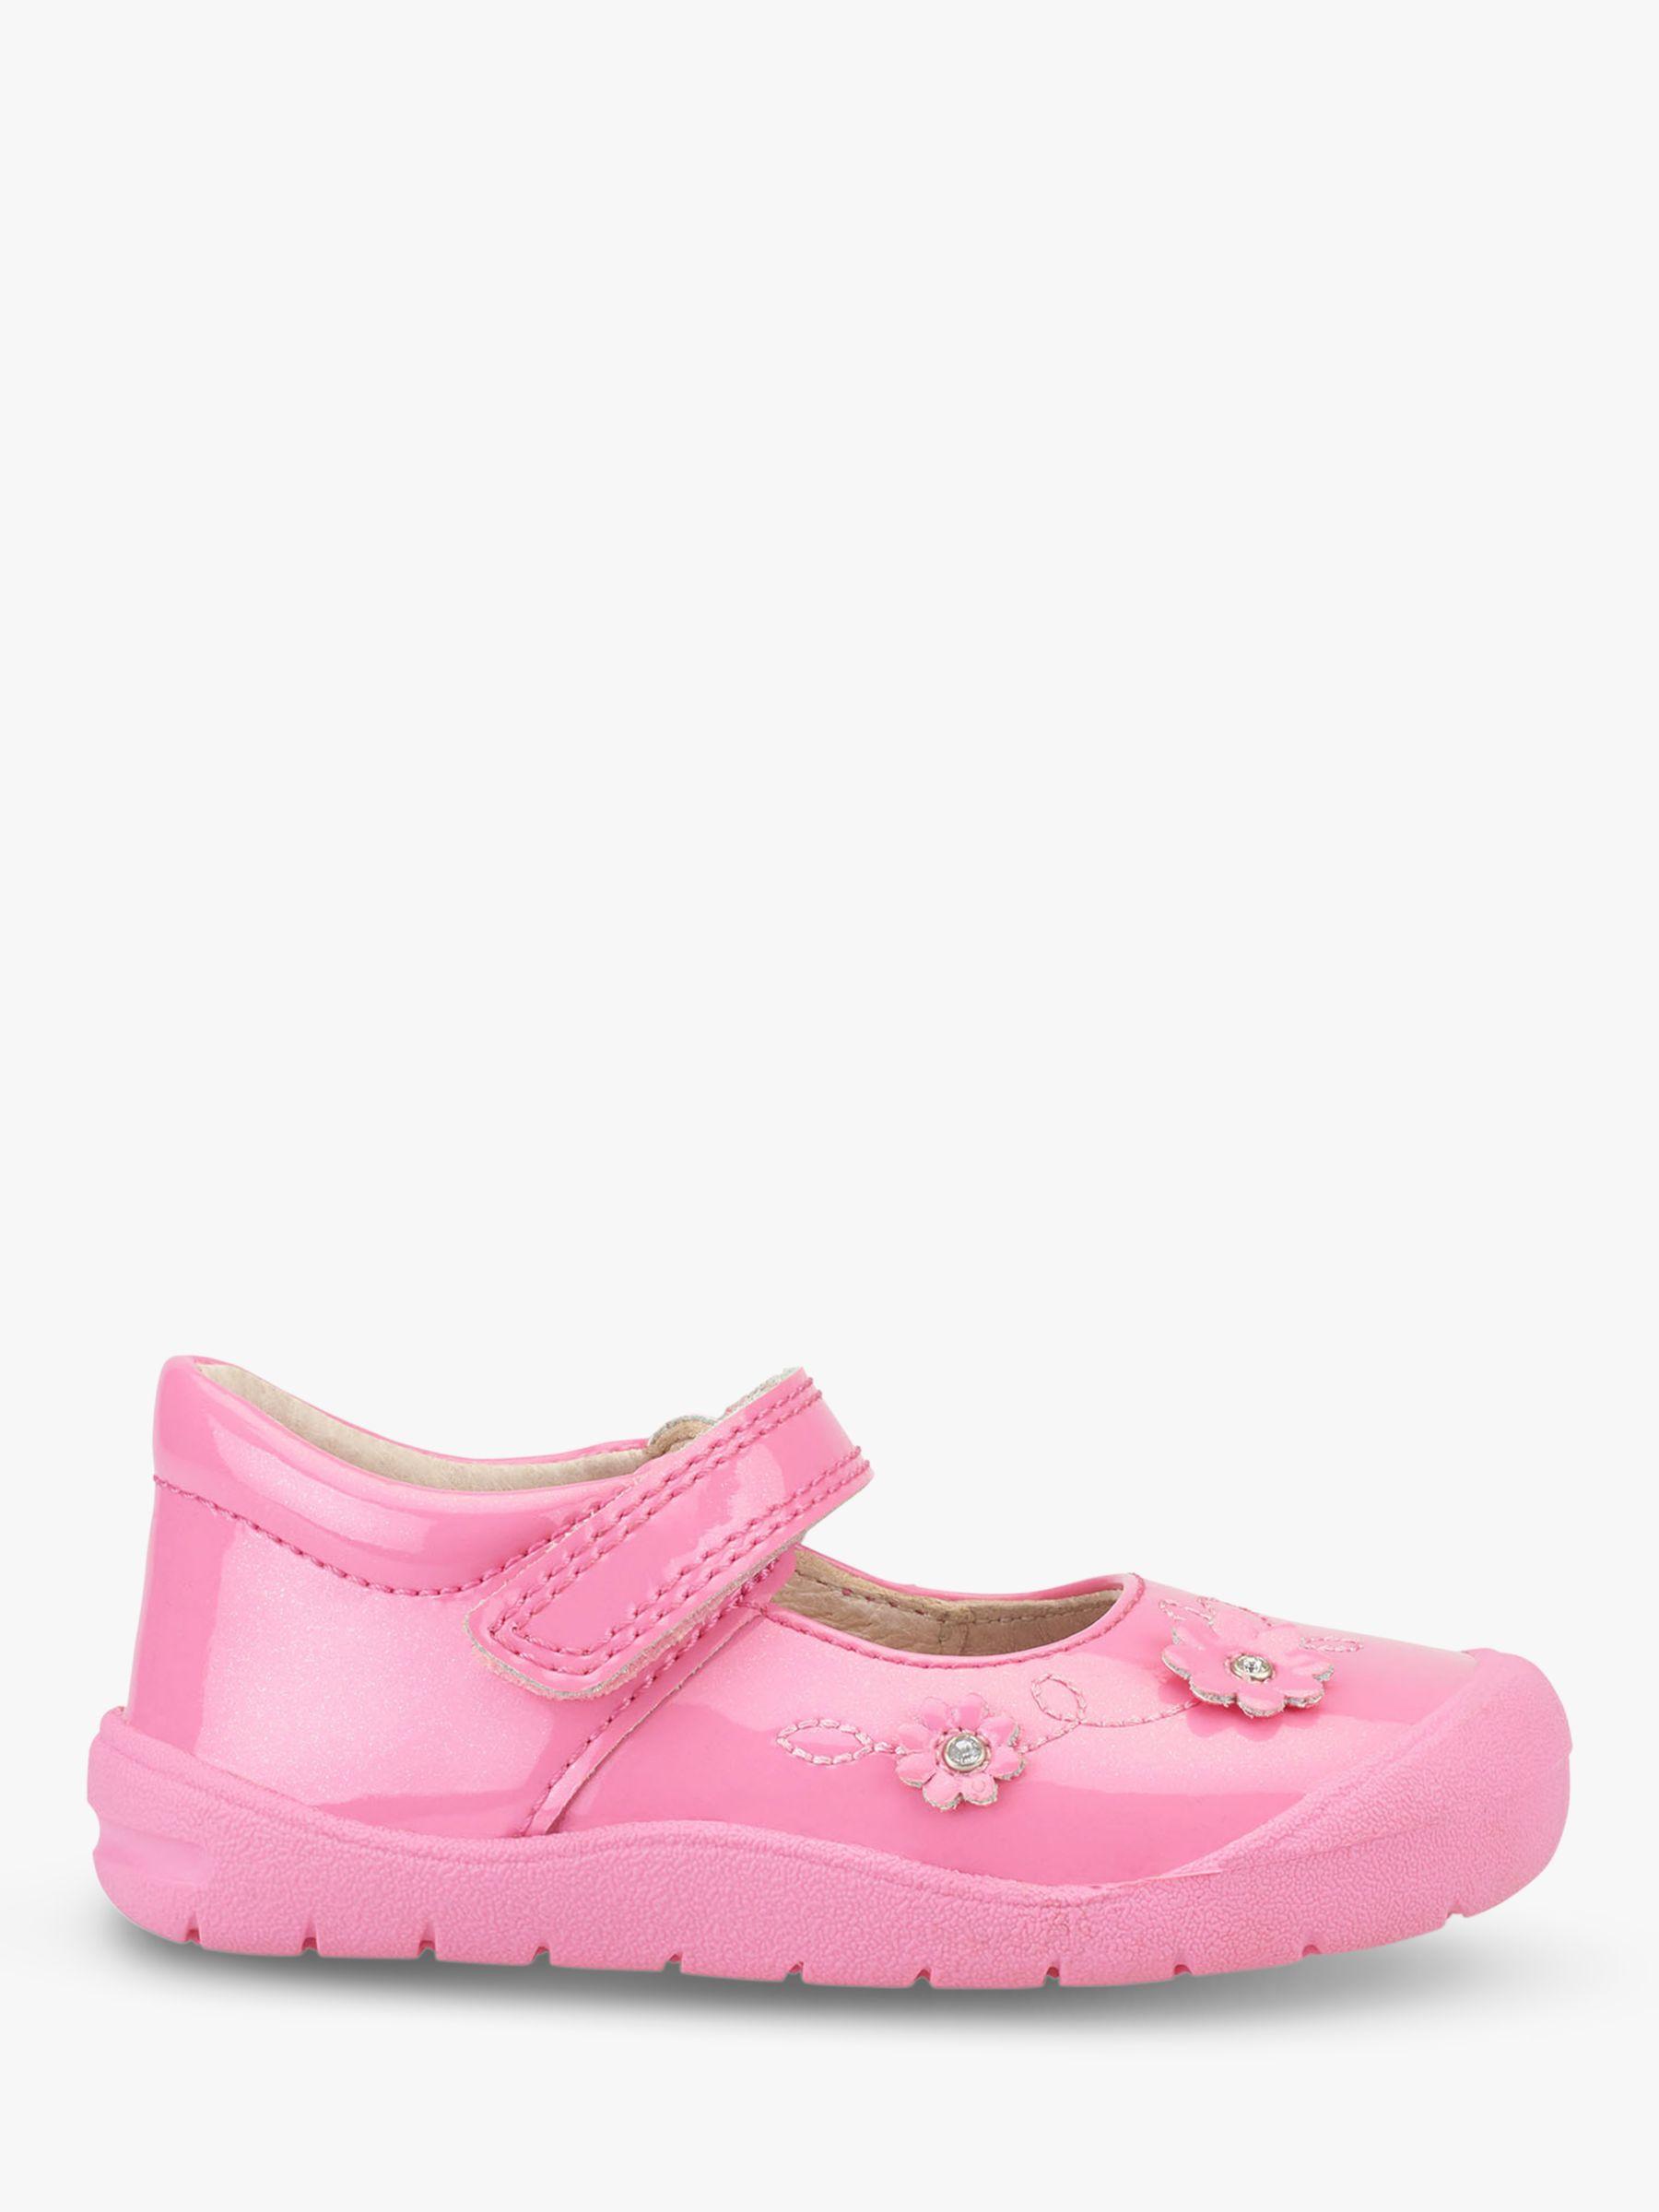 Start-Rite Start-rite Children's Flex T-Bar Riptape Pre-Walker Shoes, Bright Pink Glitter